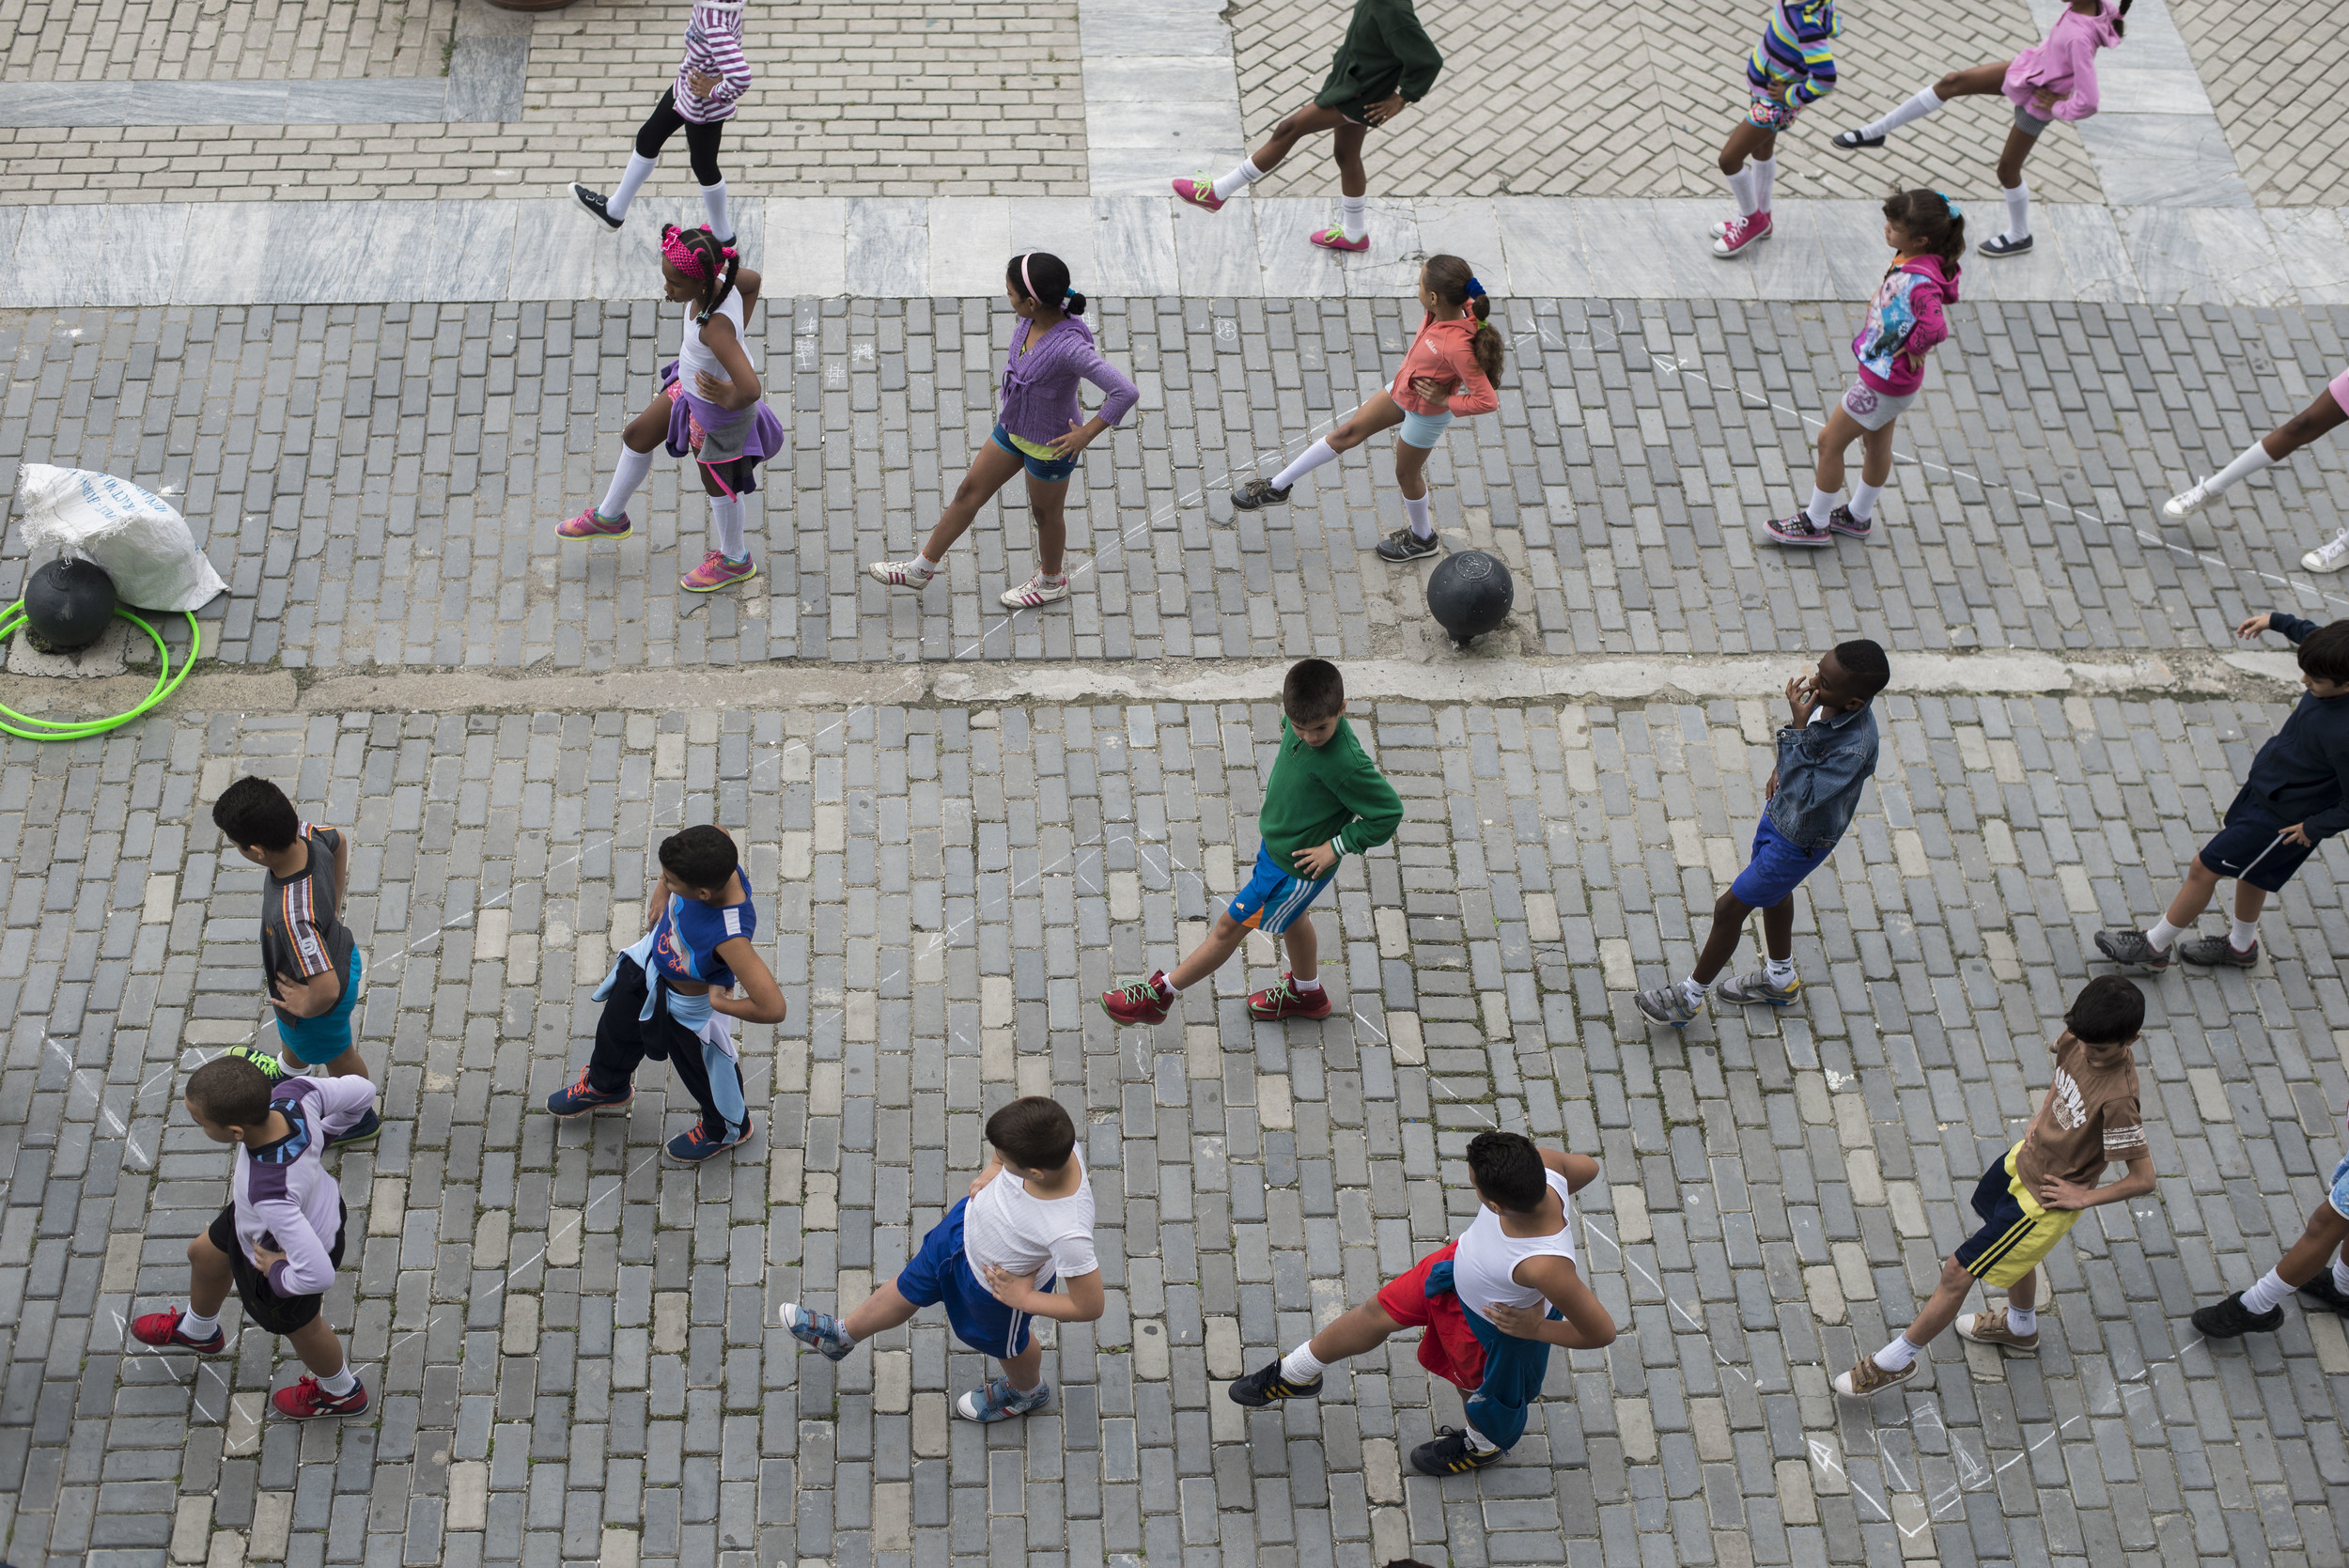 School children participate in exercises in the Plaza Vieja in Old Havana, Cuba on Jan. 18, 2016.